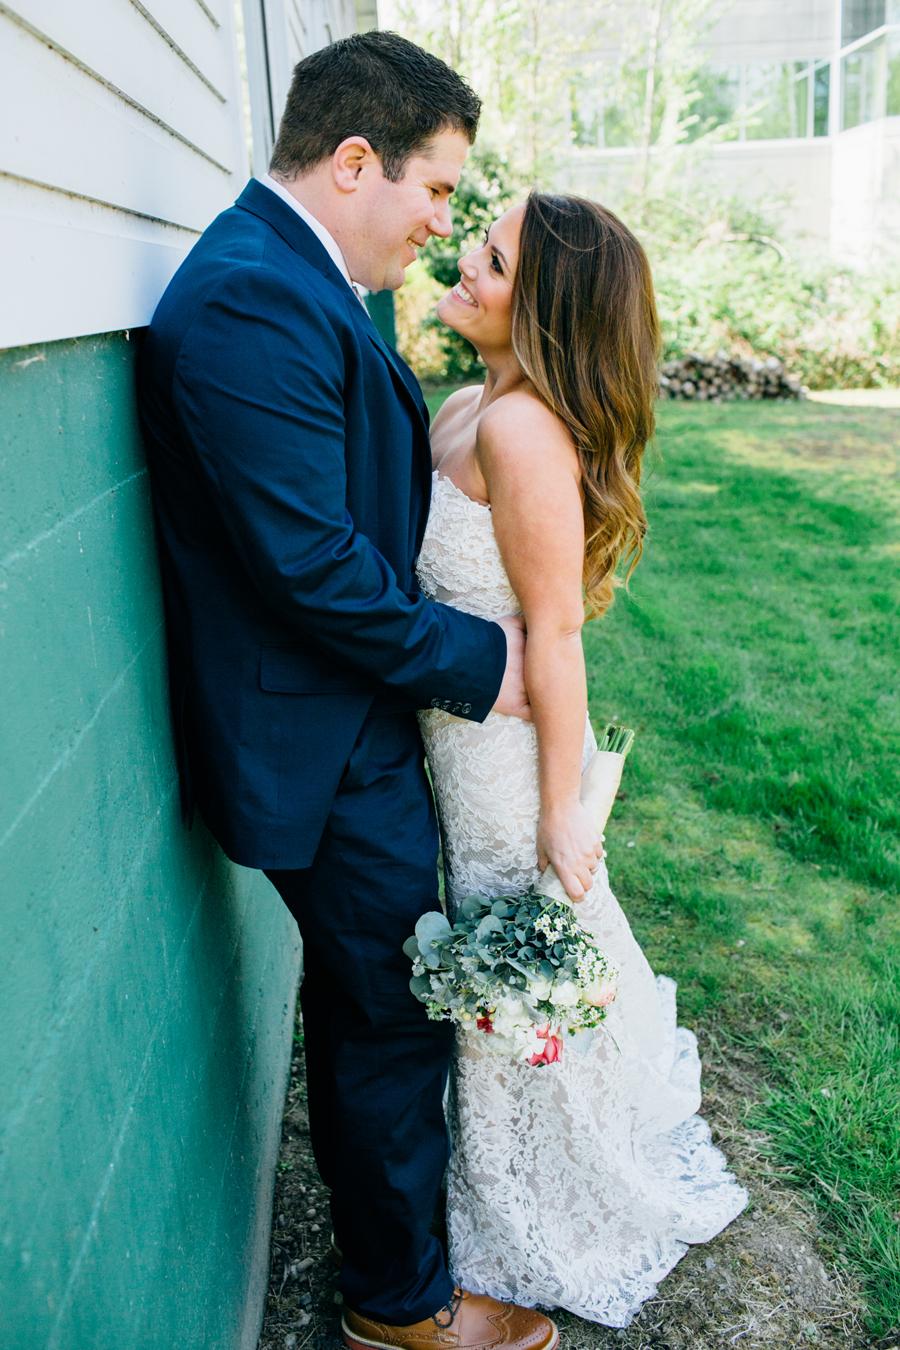 052-seattle-bothell-wedding-photographer-russells-restaurant-wilkins-photo.jpg